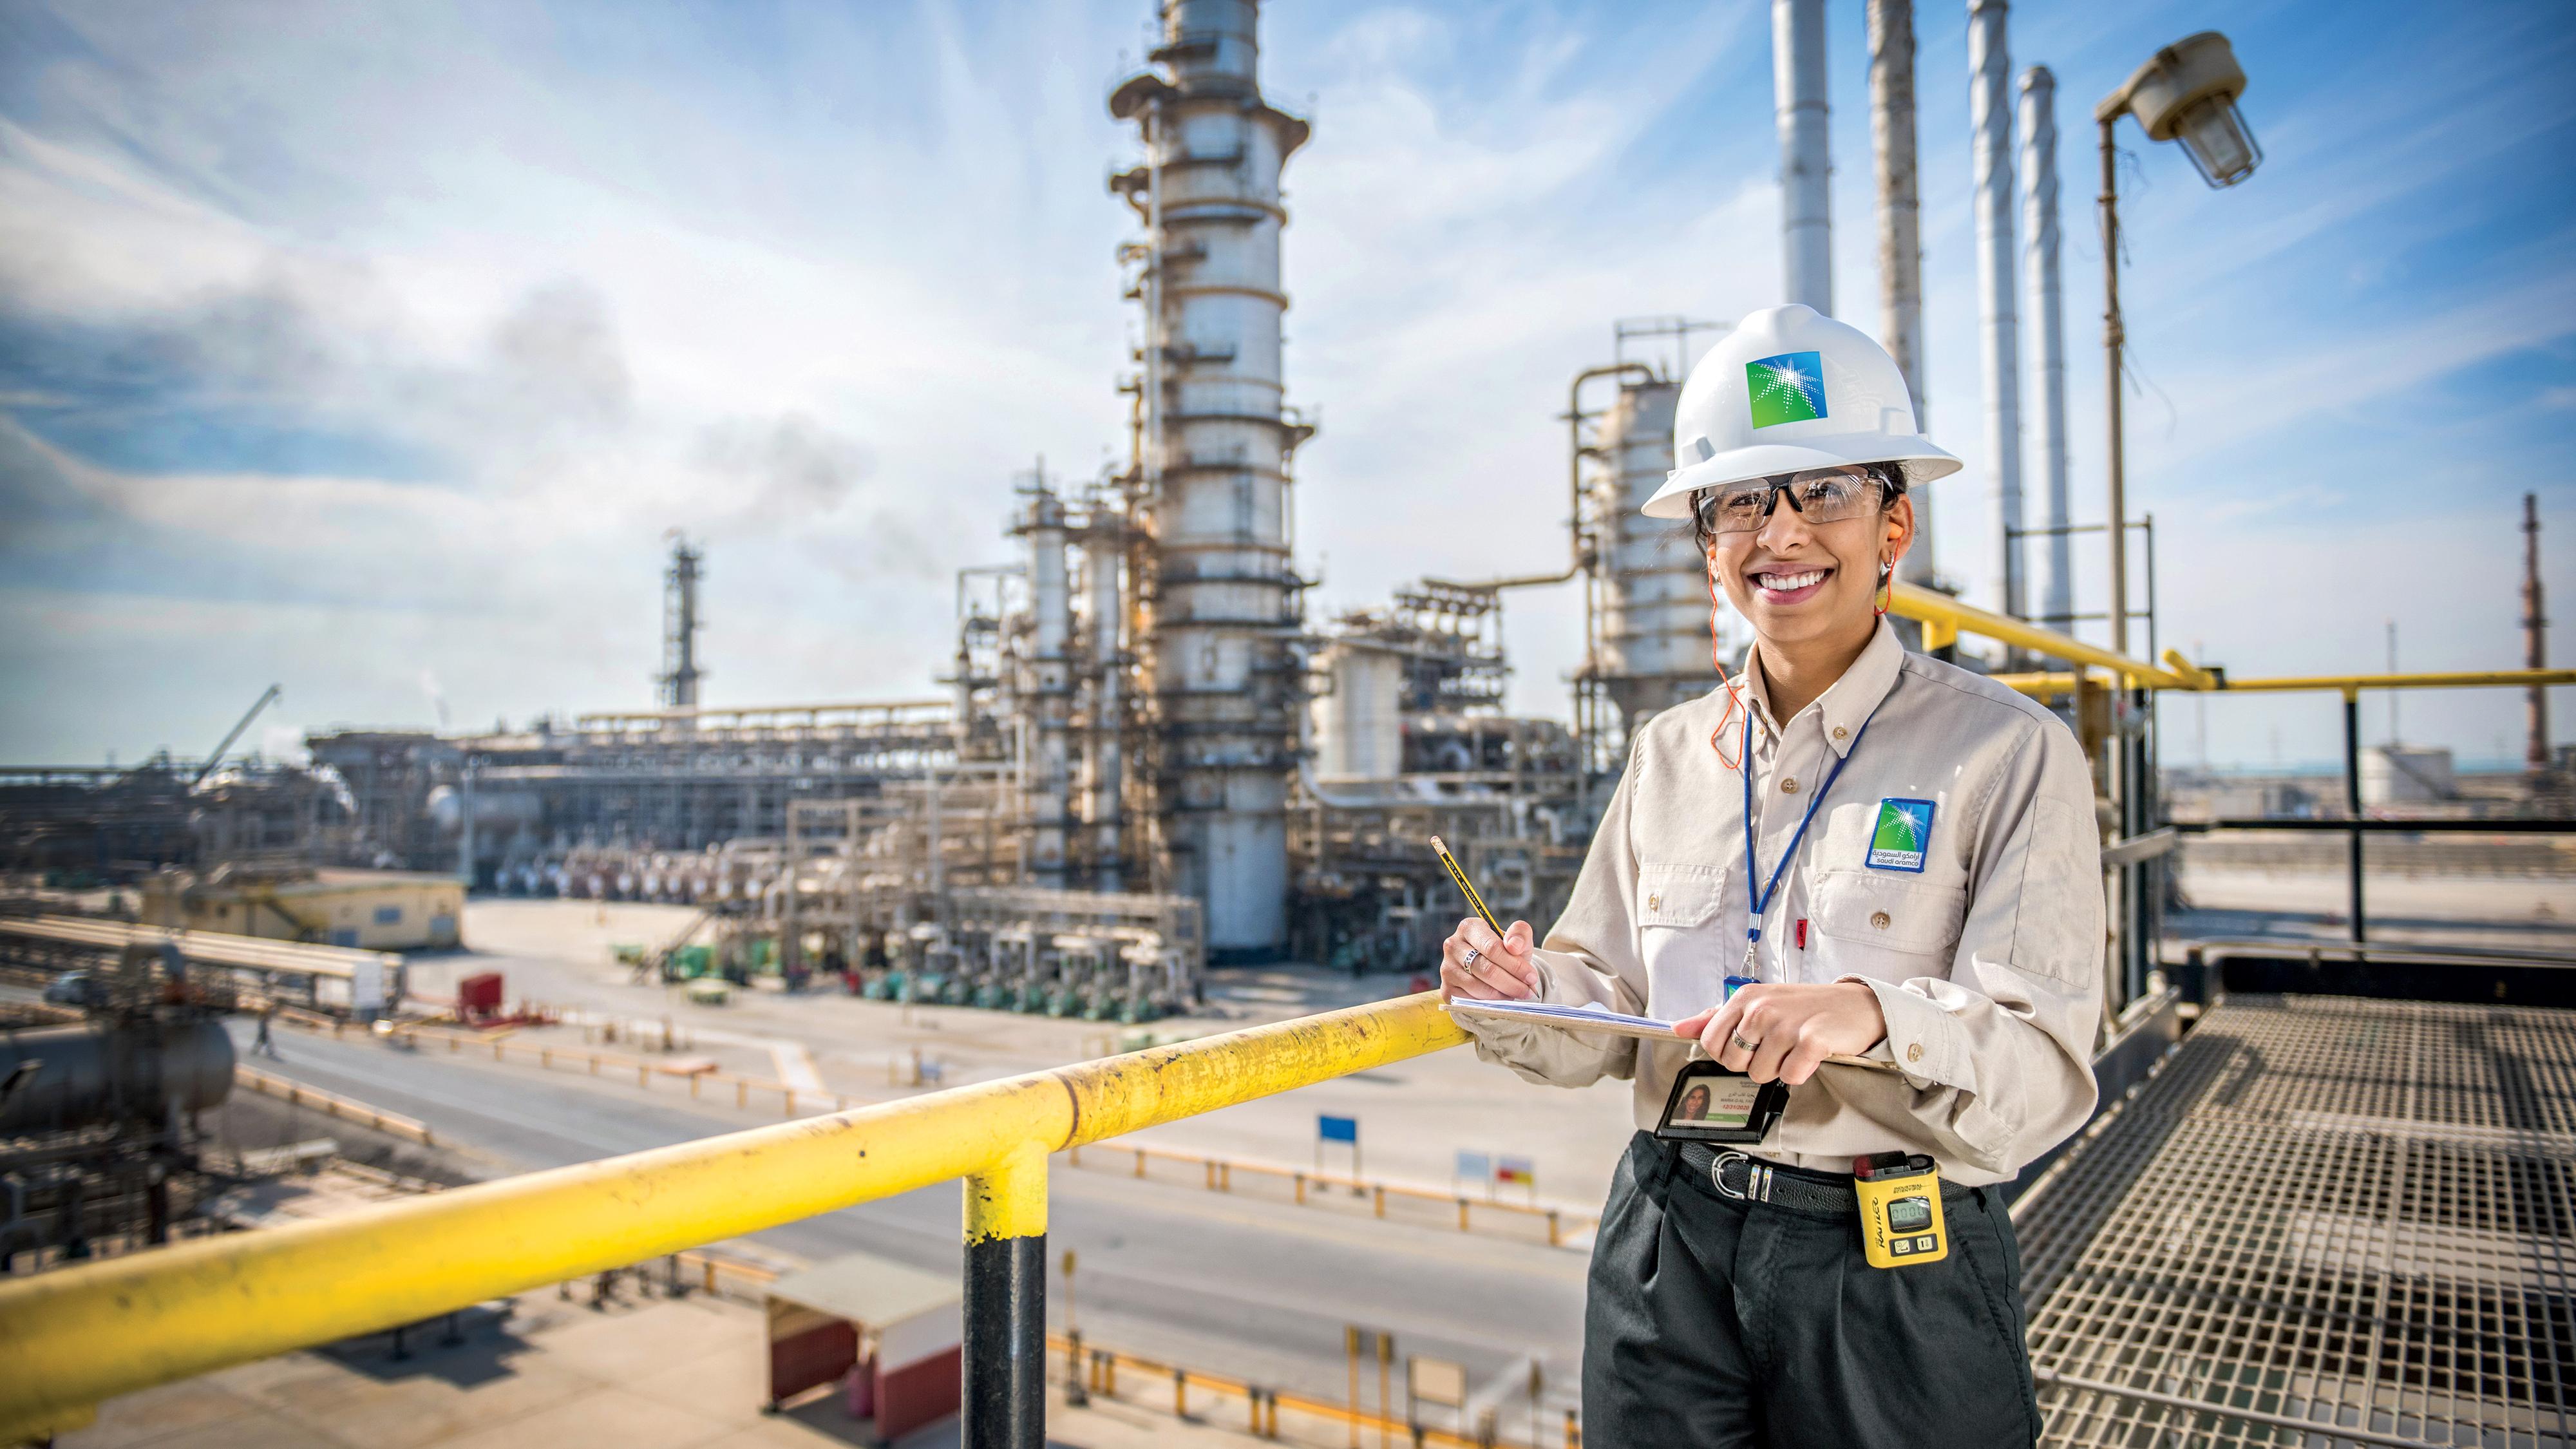 Enabling opportunity - Saudi Aramco